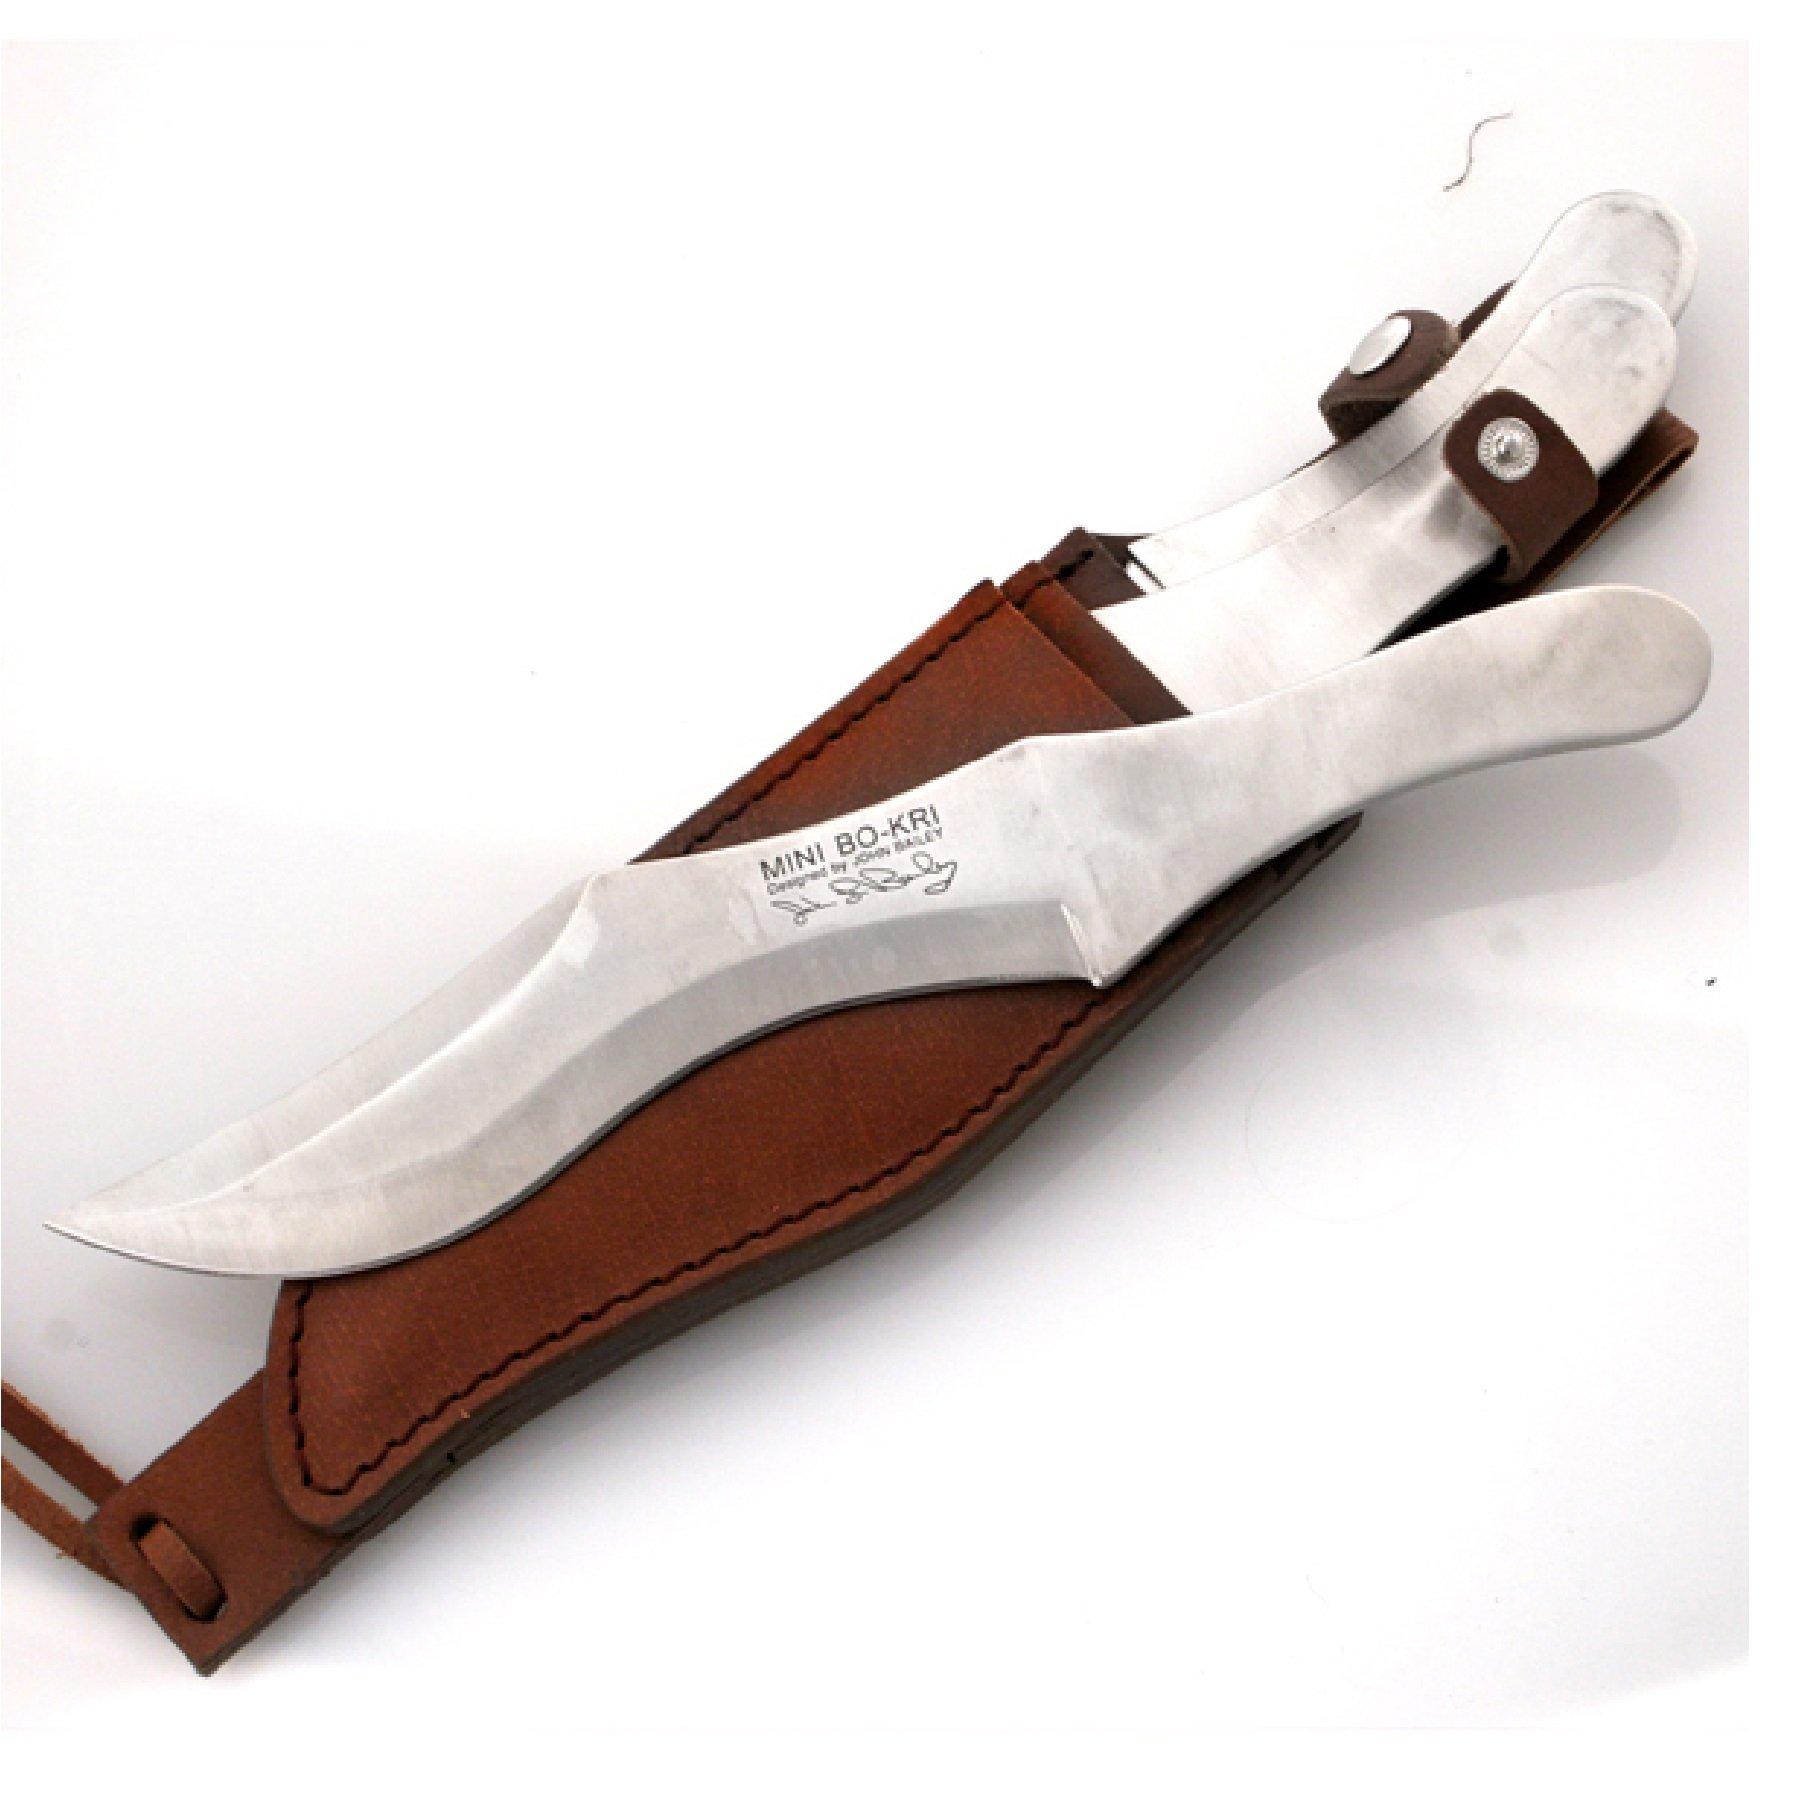 Magnum Bailey Mini Bo-Kri Knife